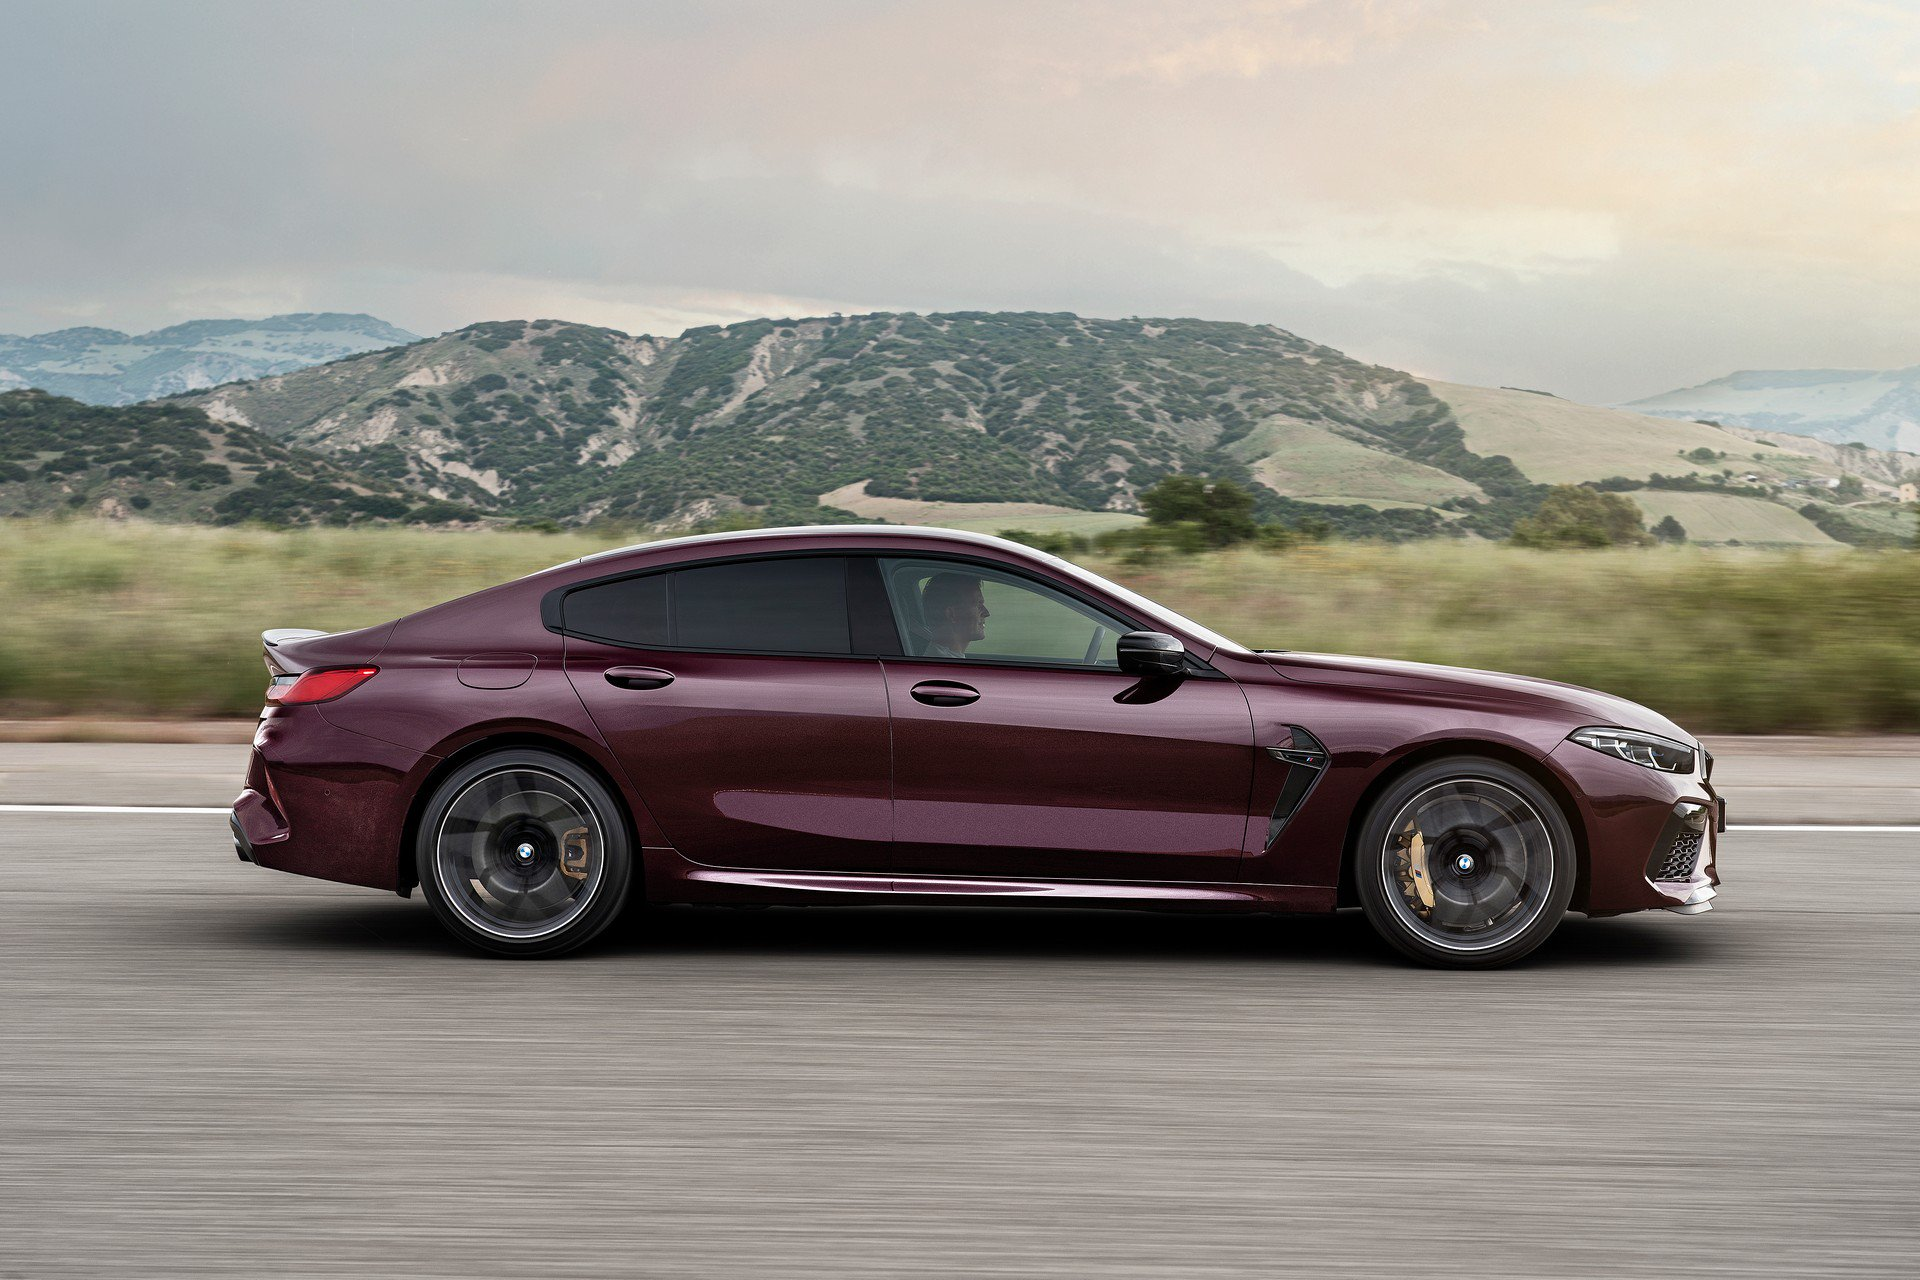 2020-bmw-m8-gran-coupe-4.jpg